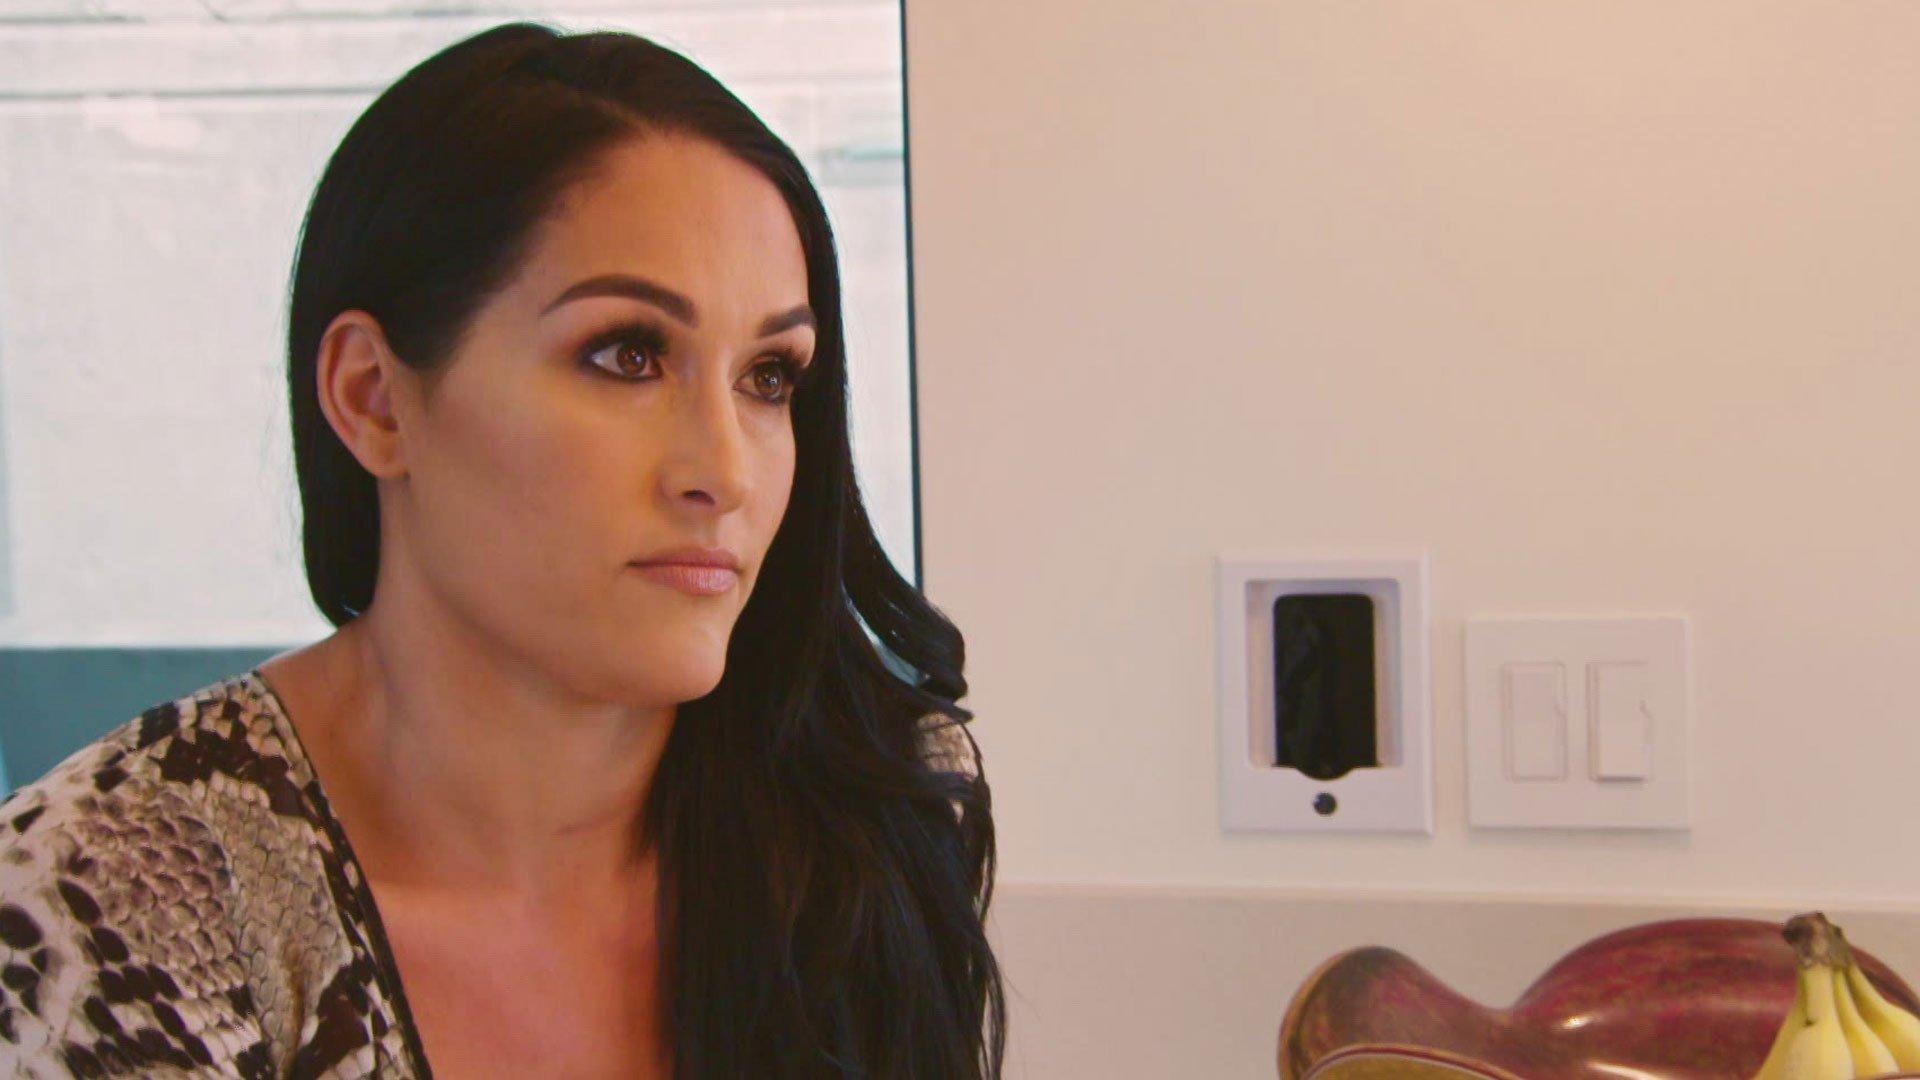 John Cena revit quand Nikki Bella admet qu'elle peut se retirer des rings après WrestleMania: Total Bellas, 11 Octobre 2017.